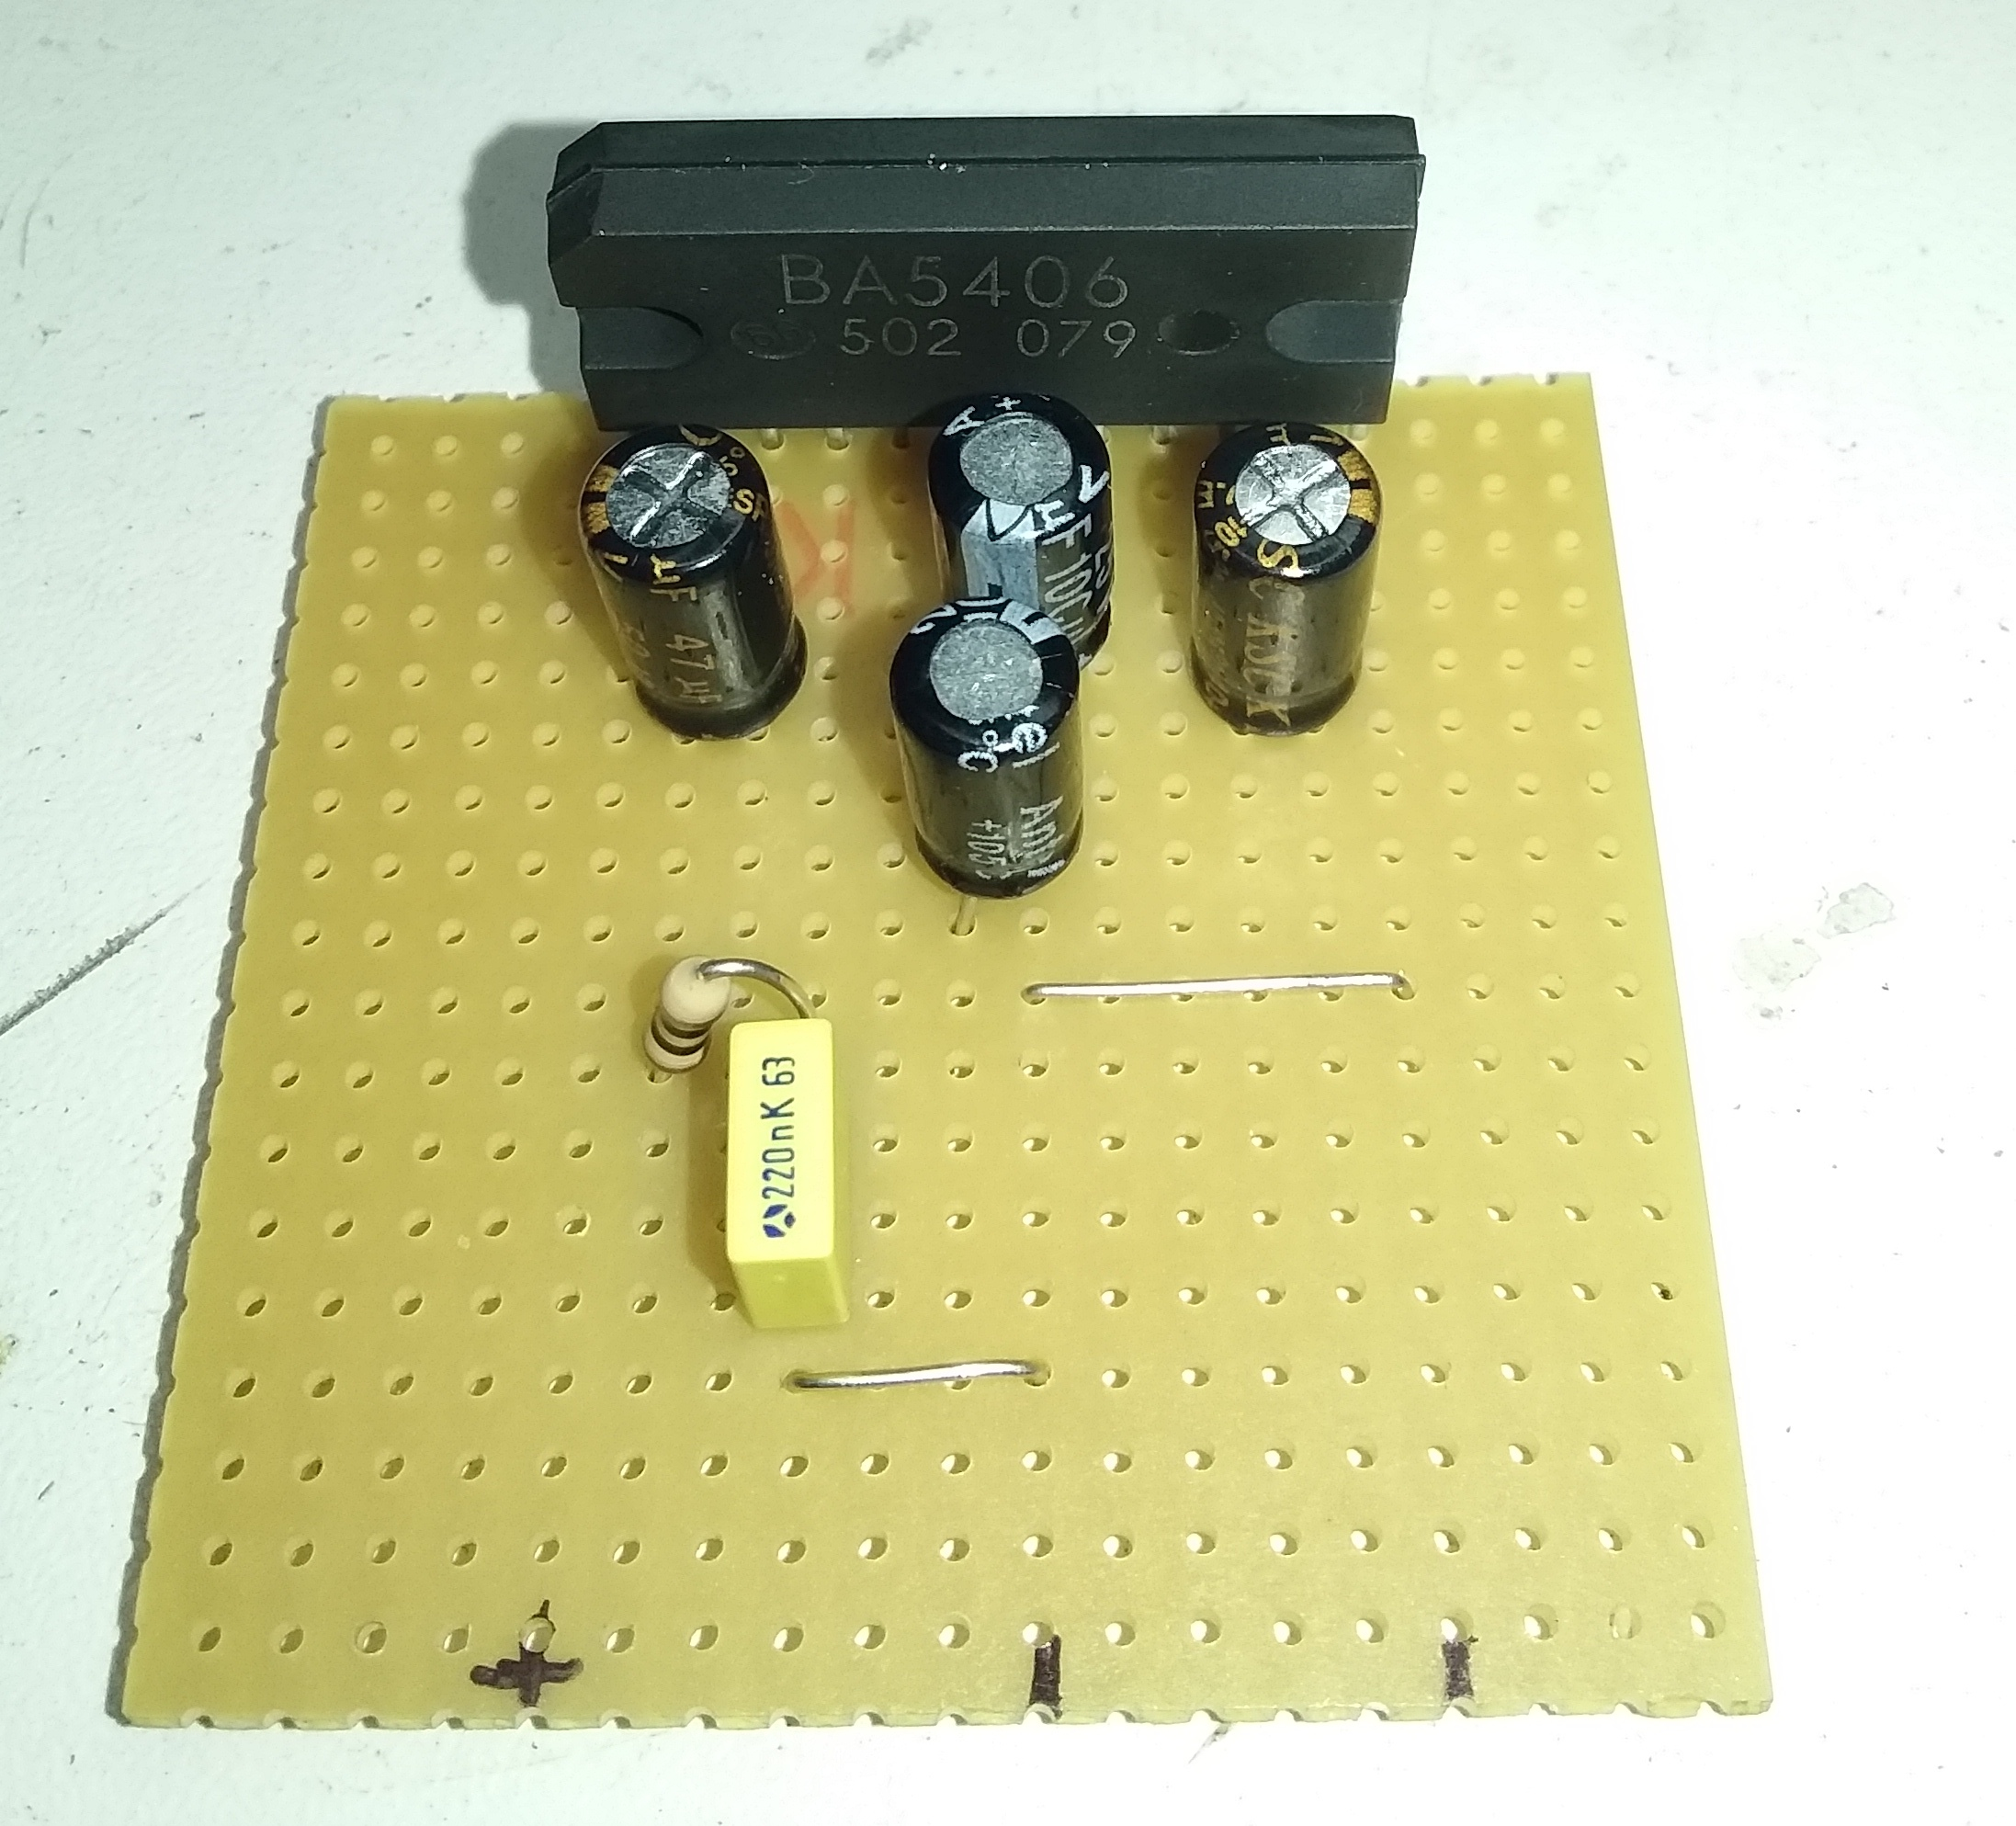 Ampli BA5406-05